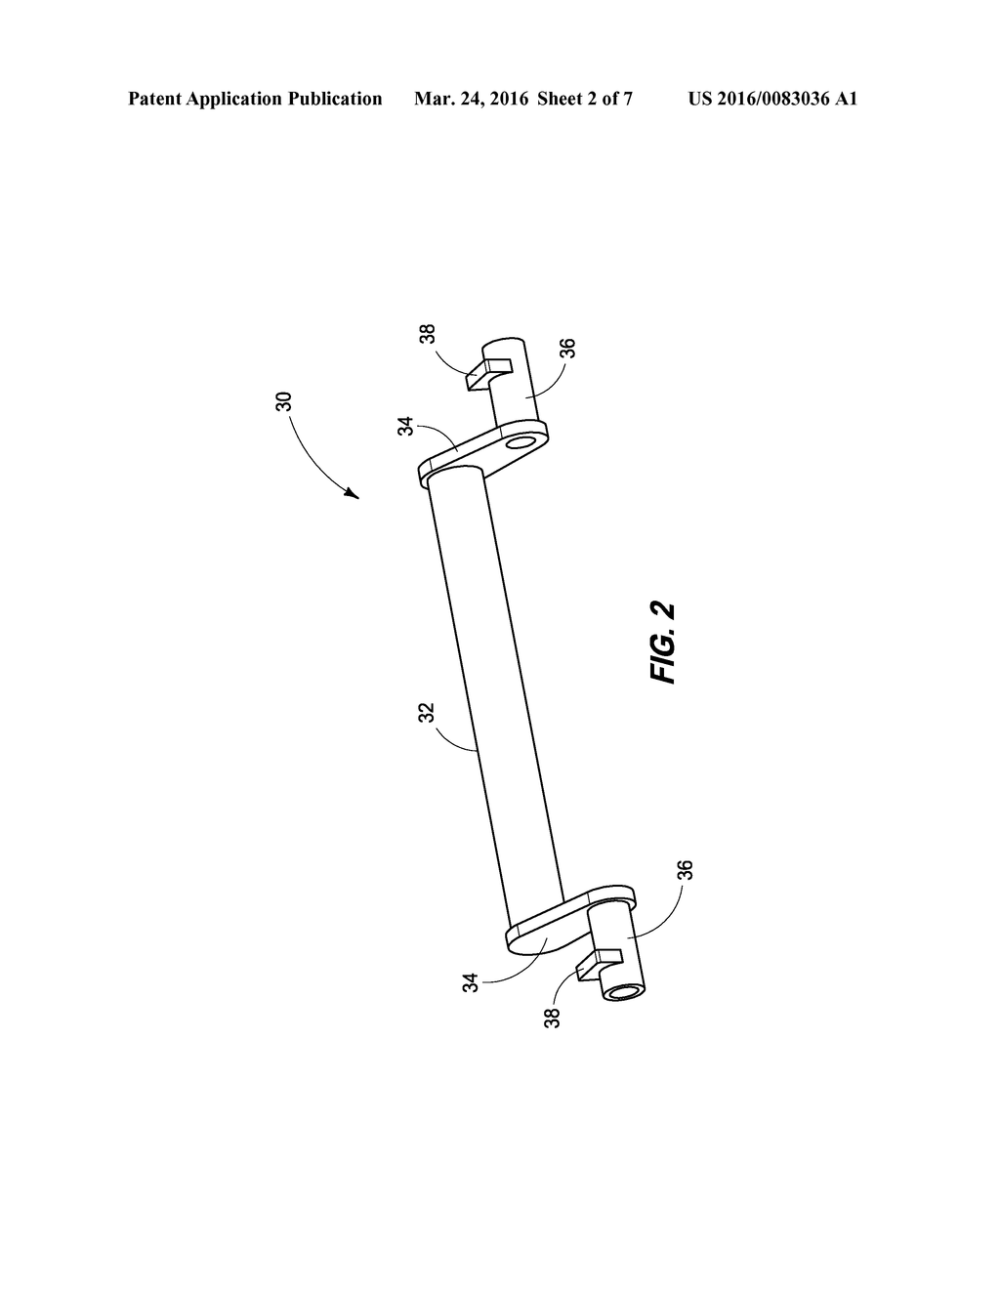 medium resolution of electric motorcycles having crash bars and methods for modifying an accident diagram software crash bar diagram